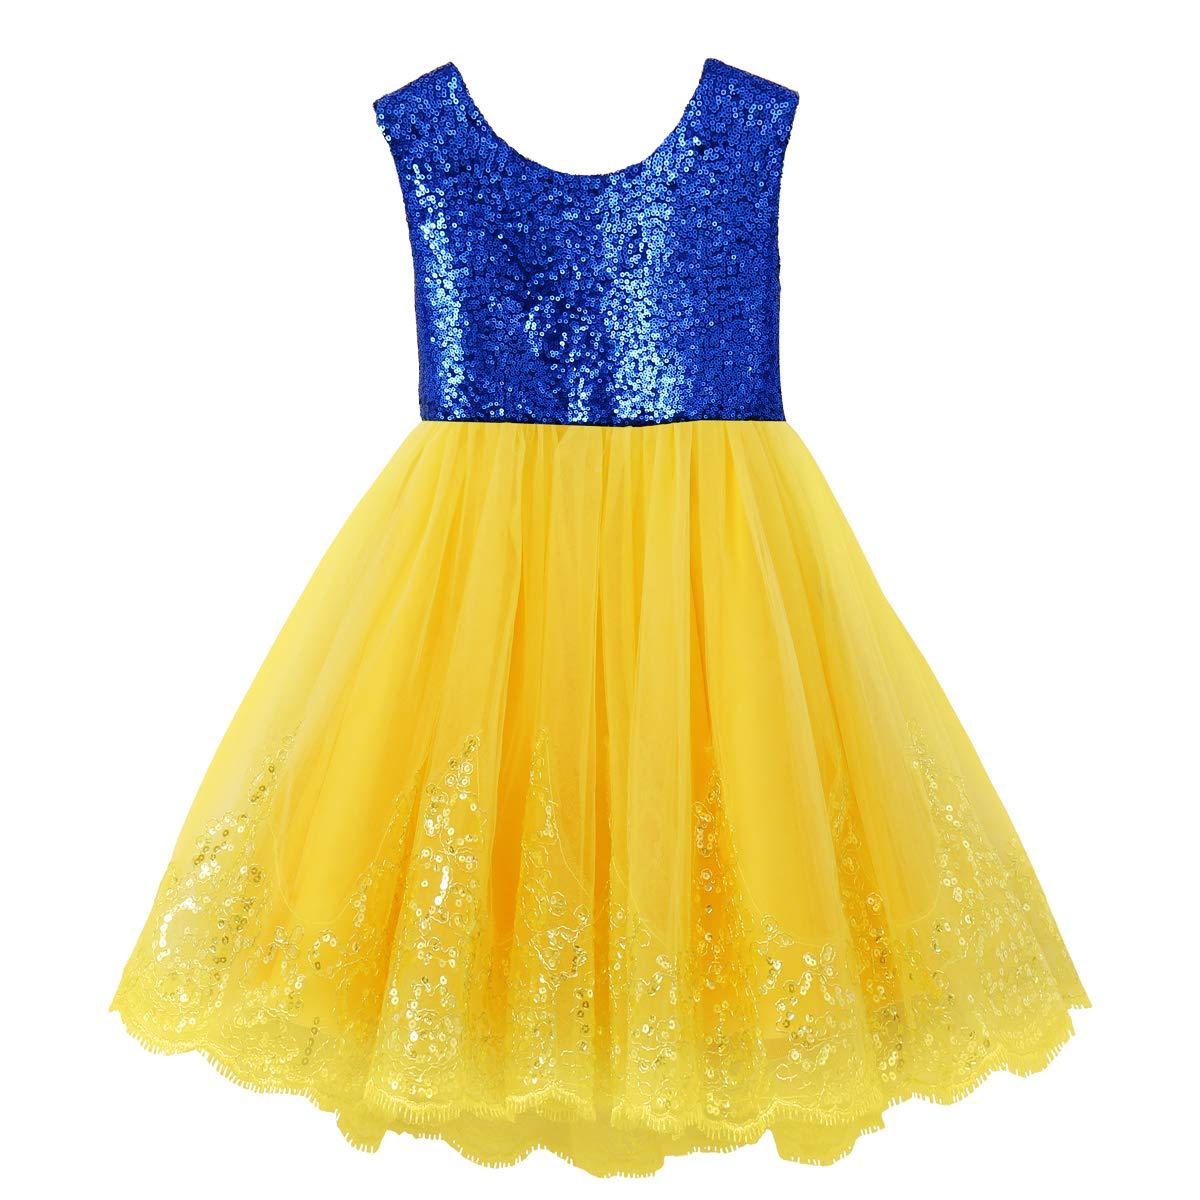 IWEMEK Kids Girls Snow White Princess Fancy Costume Dresses Up Cosplay Birthday Party Floor Length Dance Evening Gown B 6-7